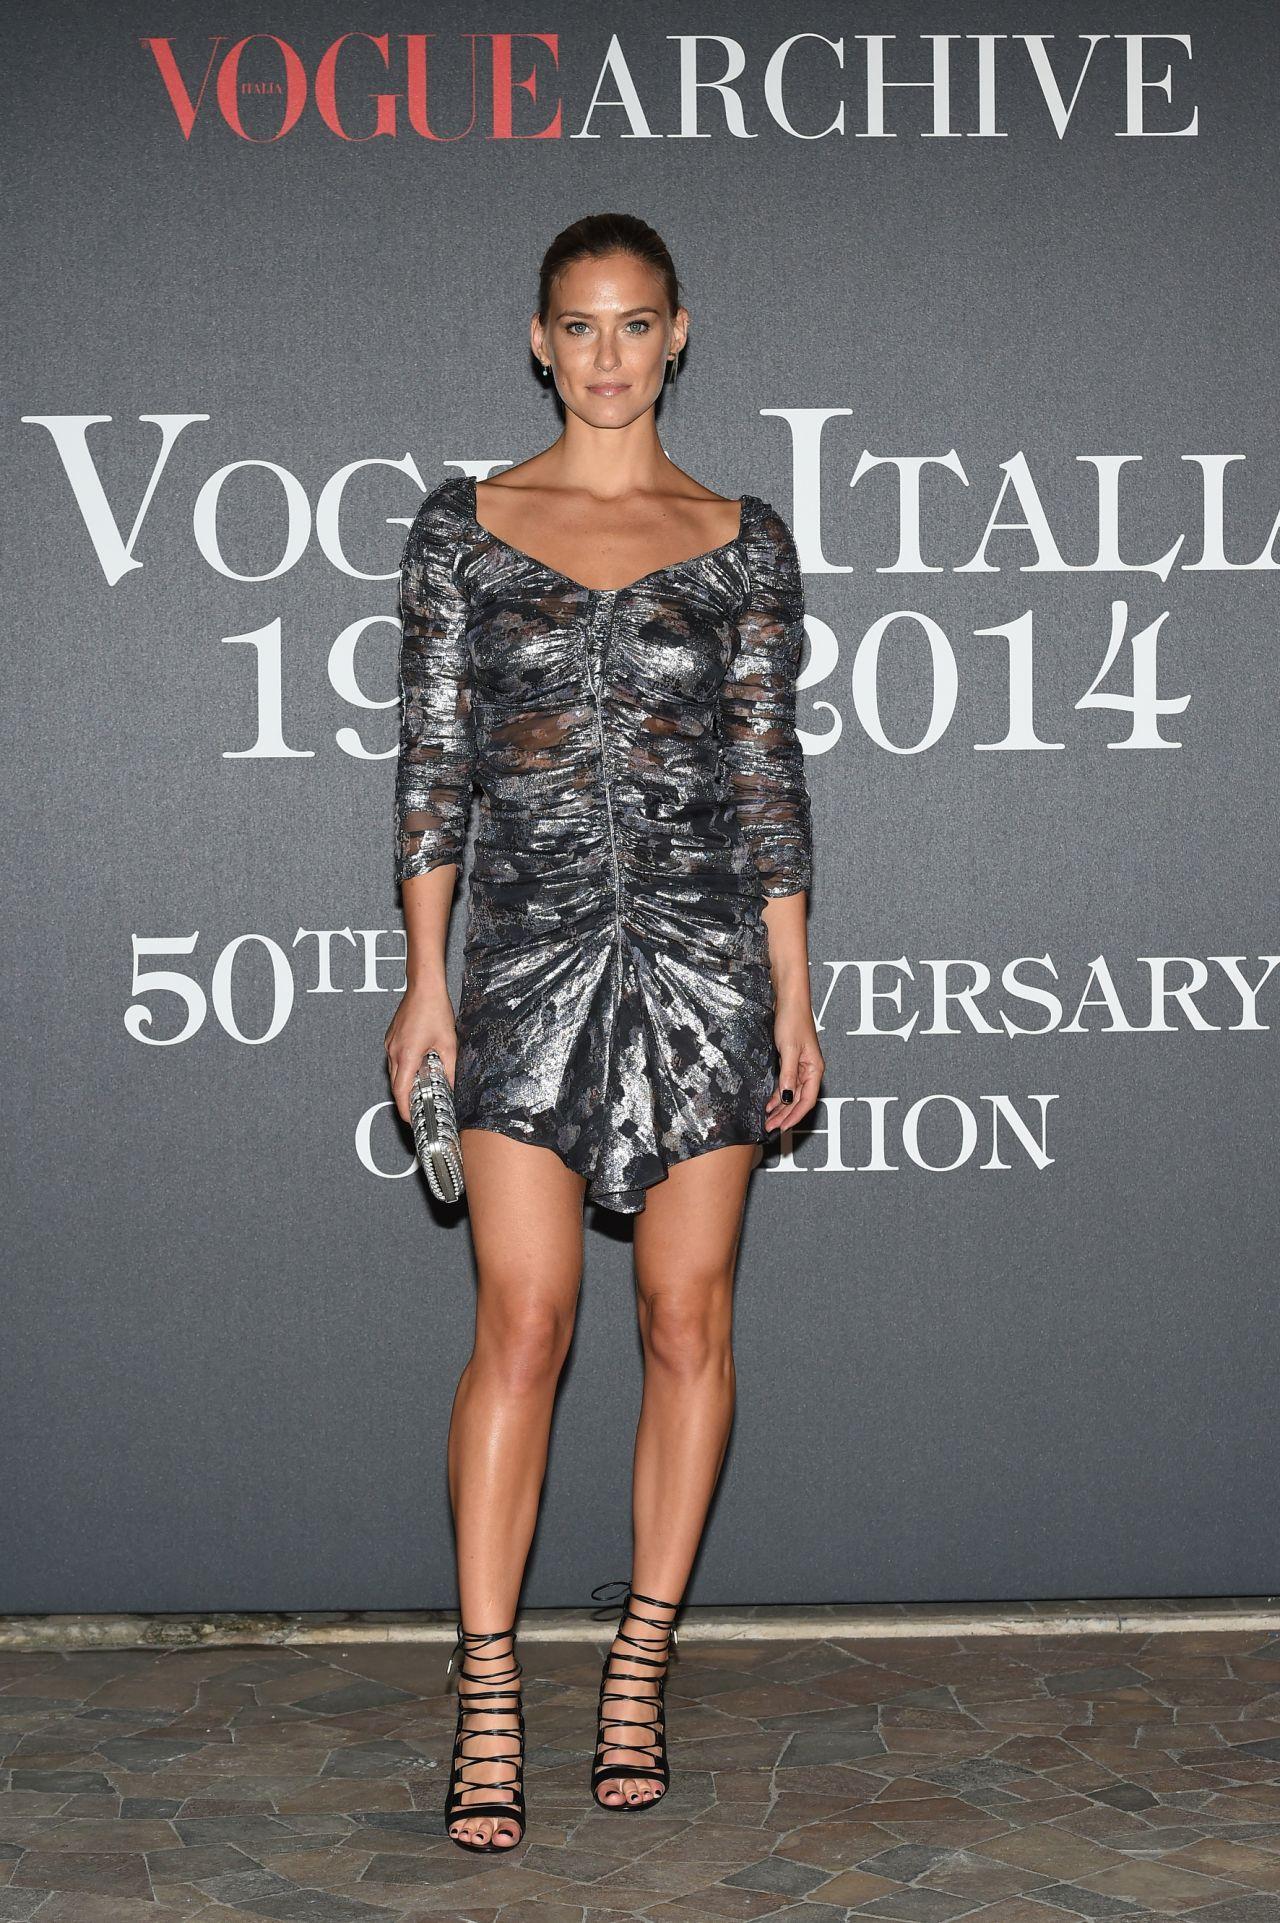 Bar Refaeli - Vogue Magazine 50 Archive Party in Milan, Italy